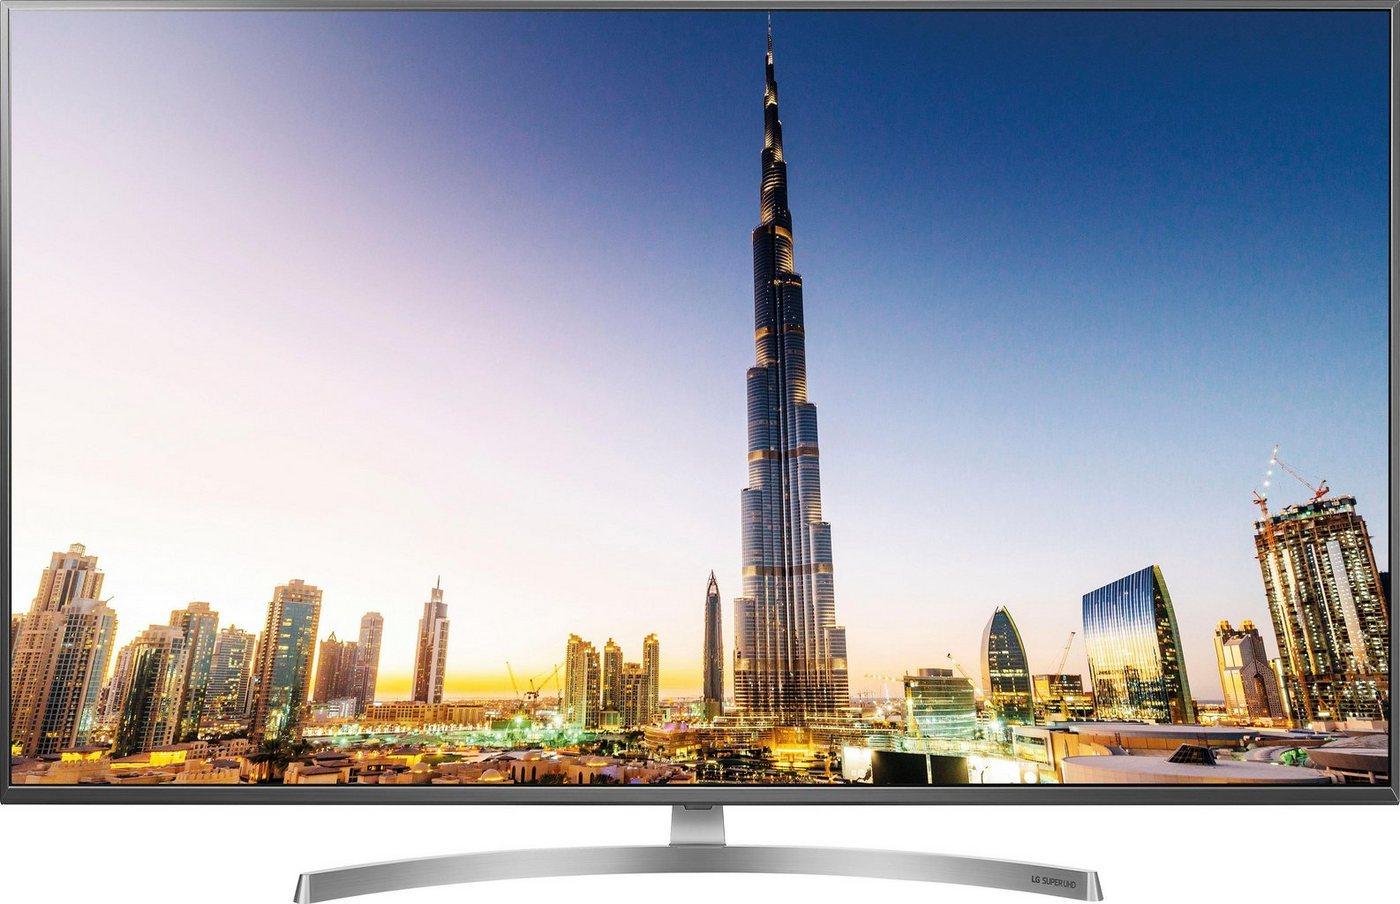 LG 55SK8100LLA LED-Fernseher (139 cm/55 Zoll, 4K Ultra HD, Smart-TV) - LG